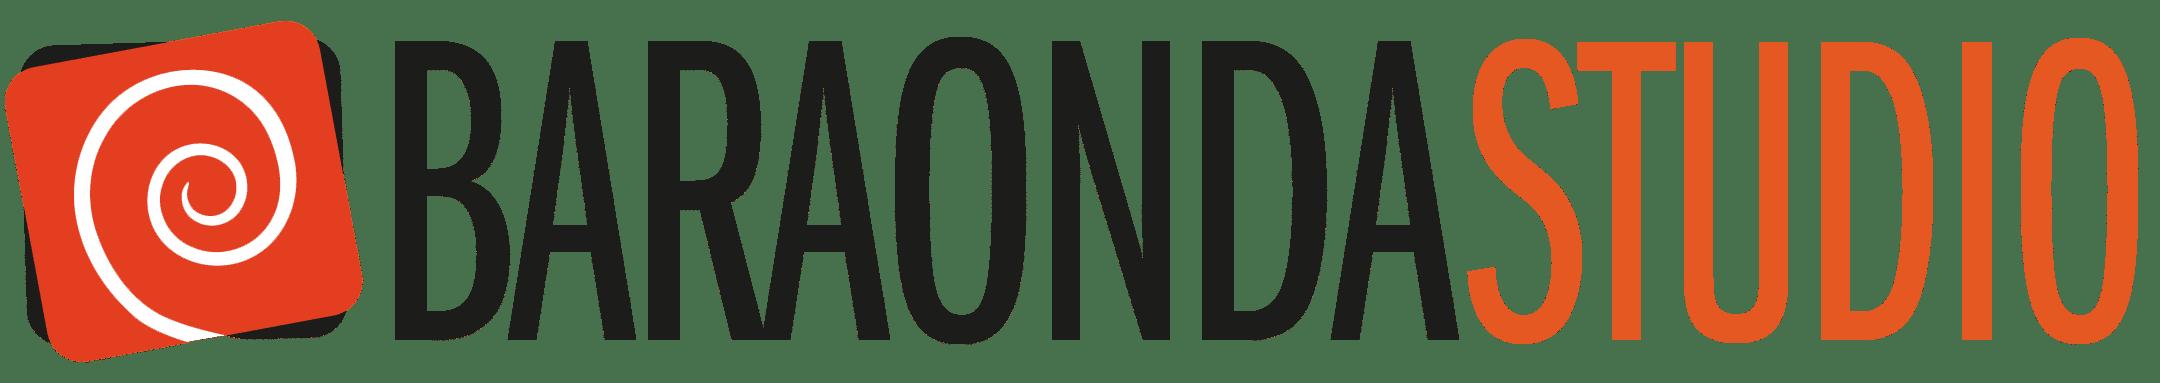 Baronda Studio